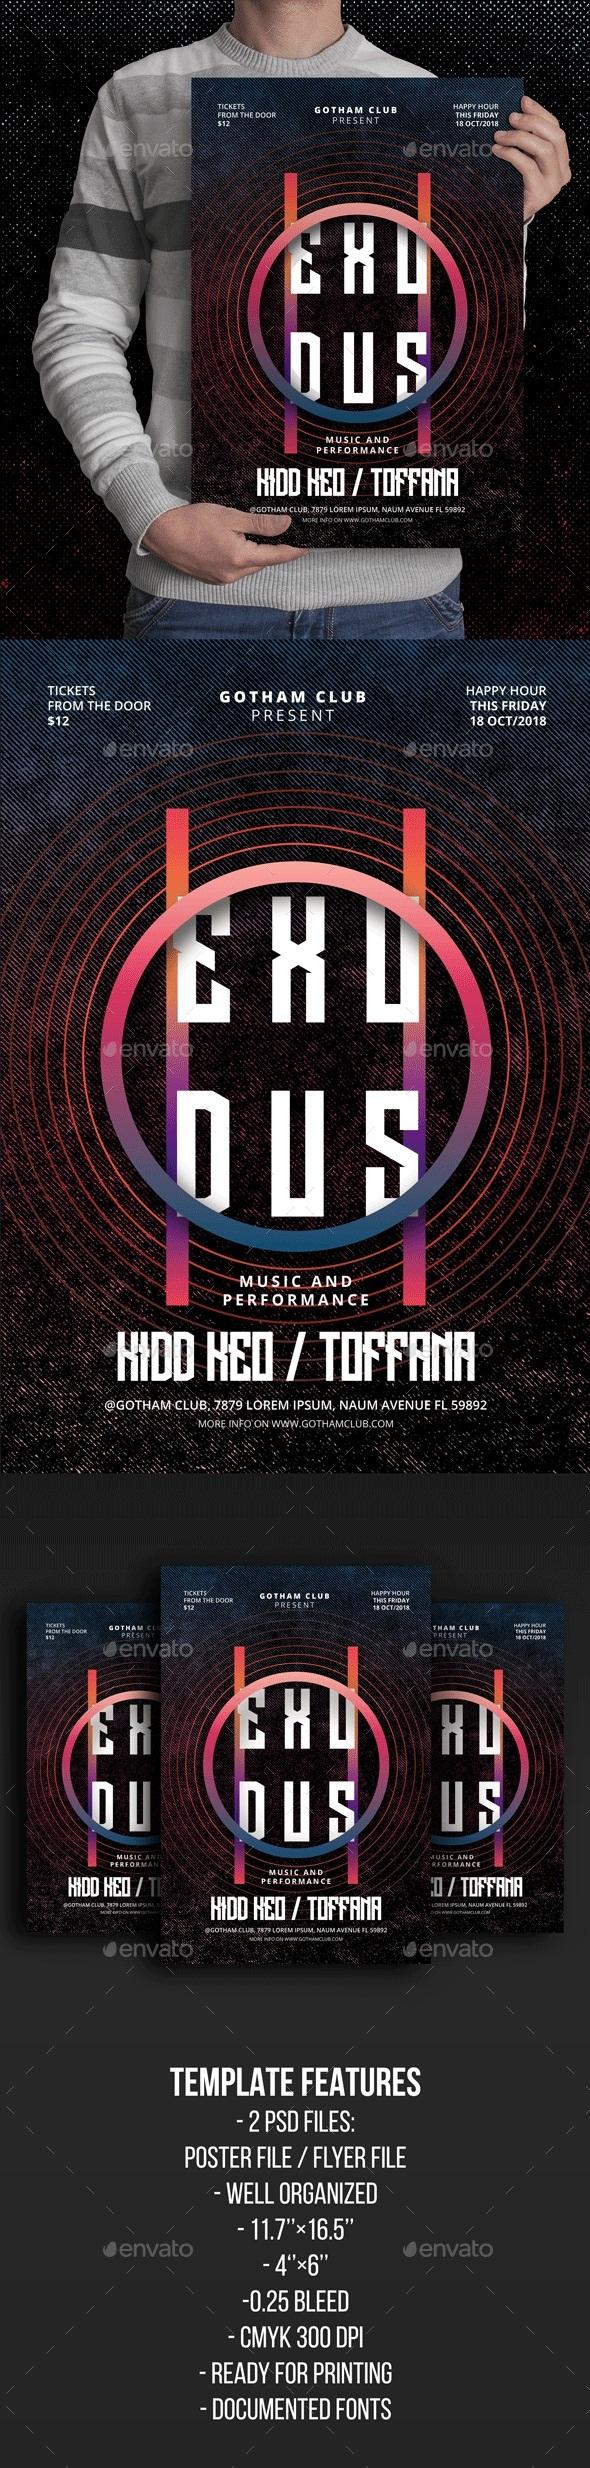 Exodus Poster/Flyer - Events Flyers